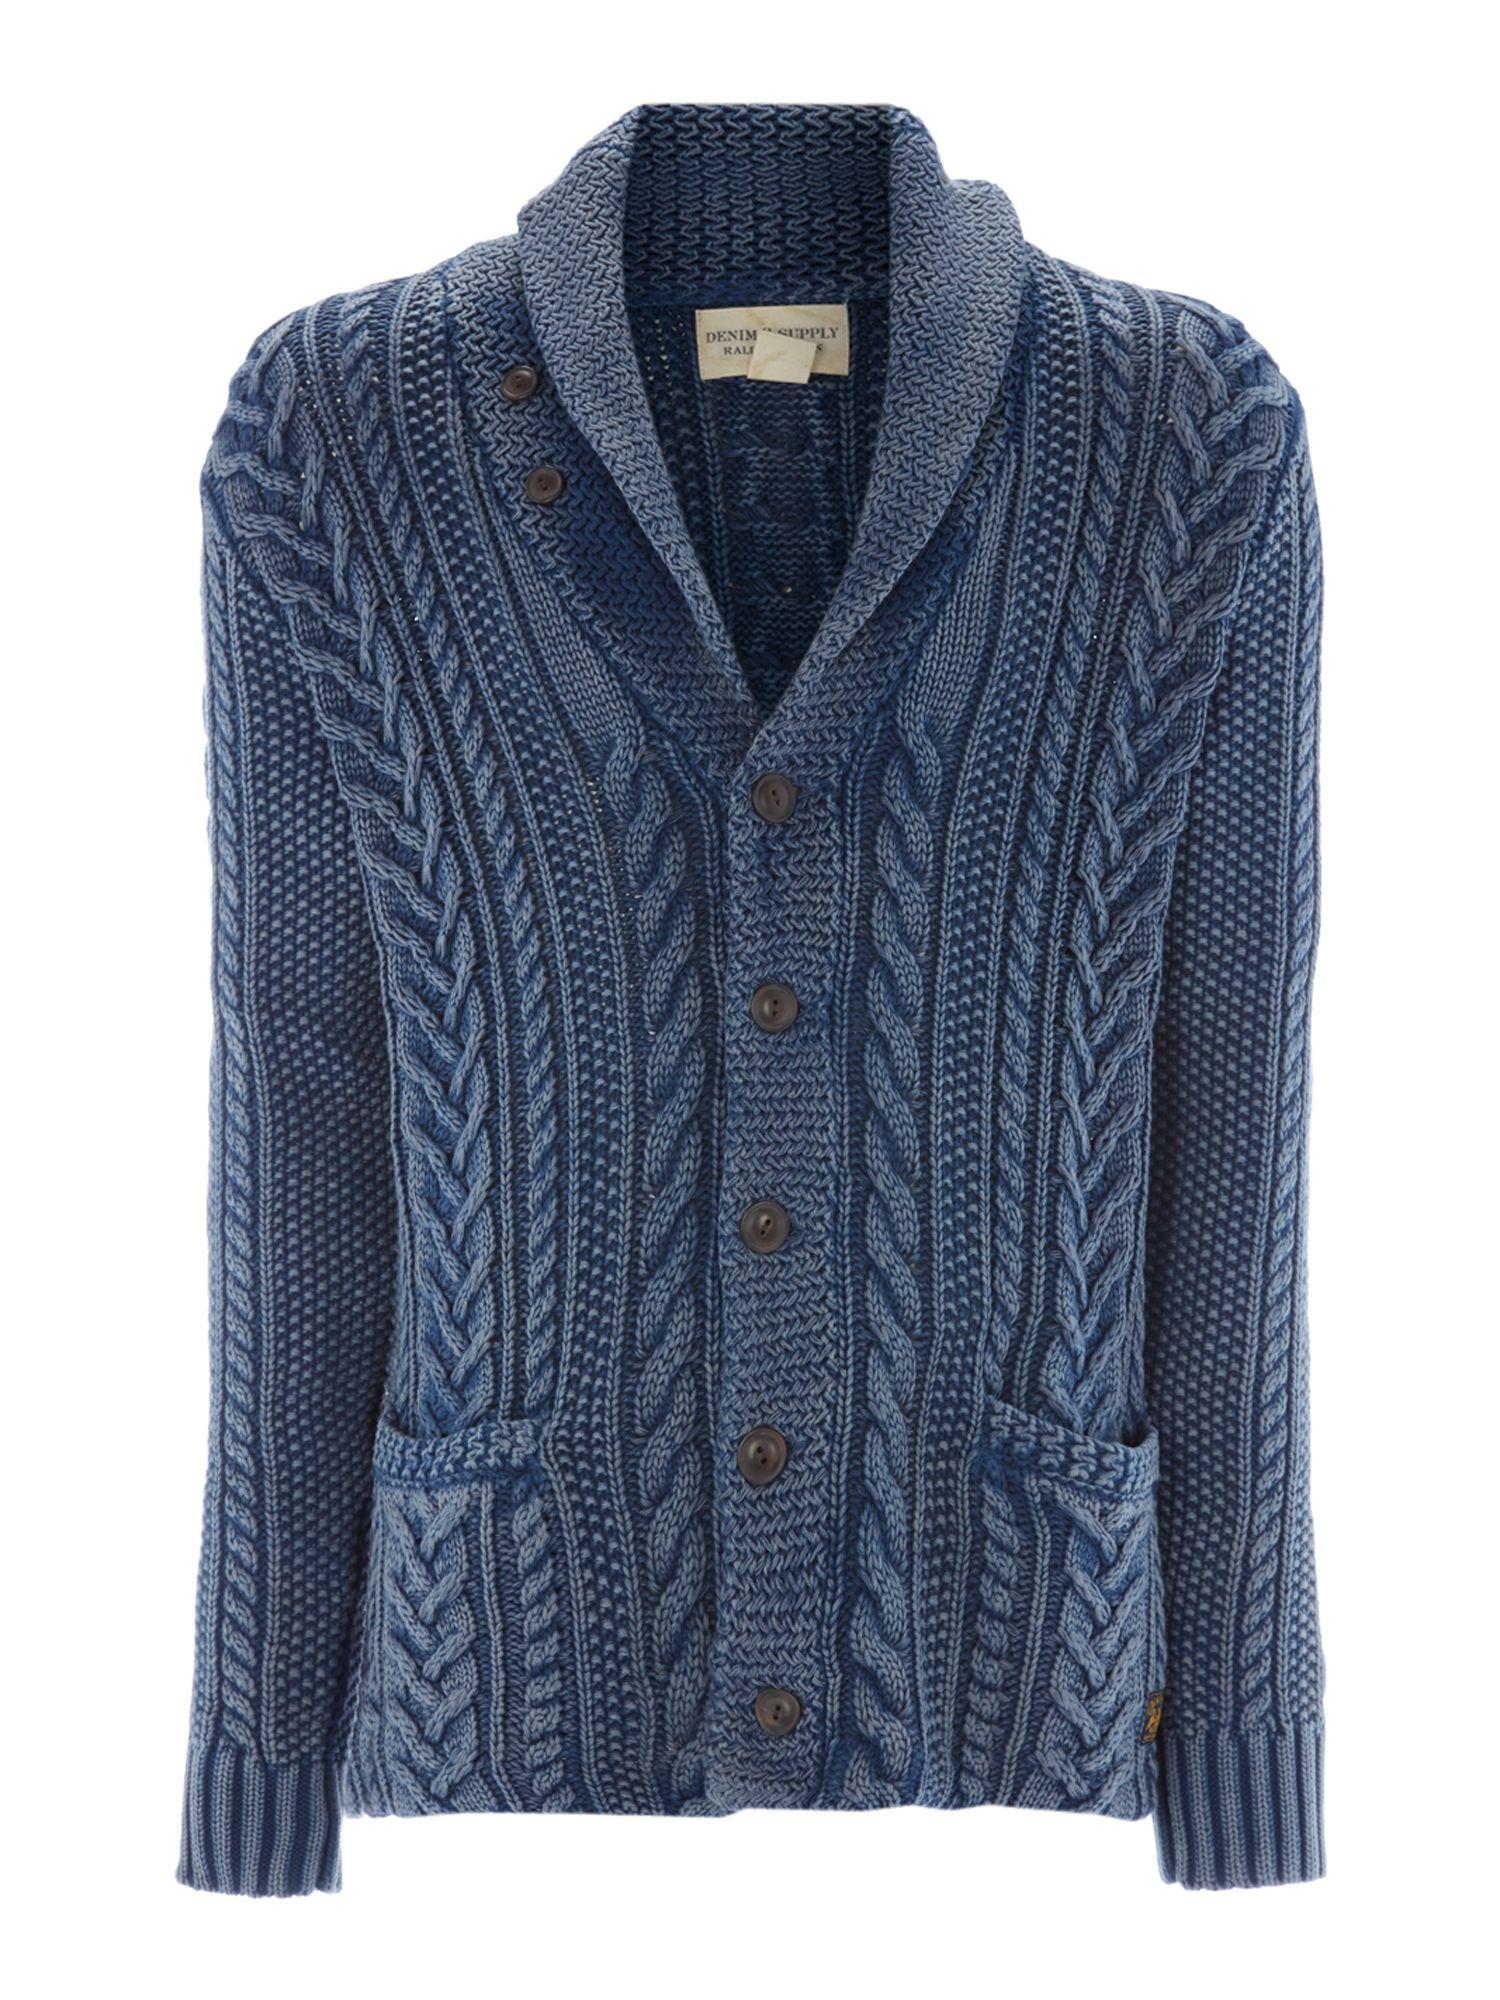 Denim Jacket Knitting Pattern : Denim & supply ralph lauren Cable Knit Shawl Cardigan in Blue for Men Lyst